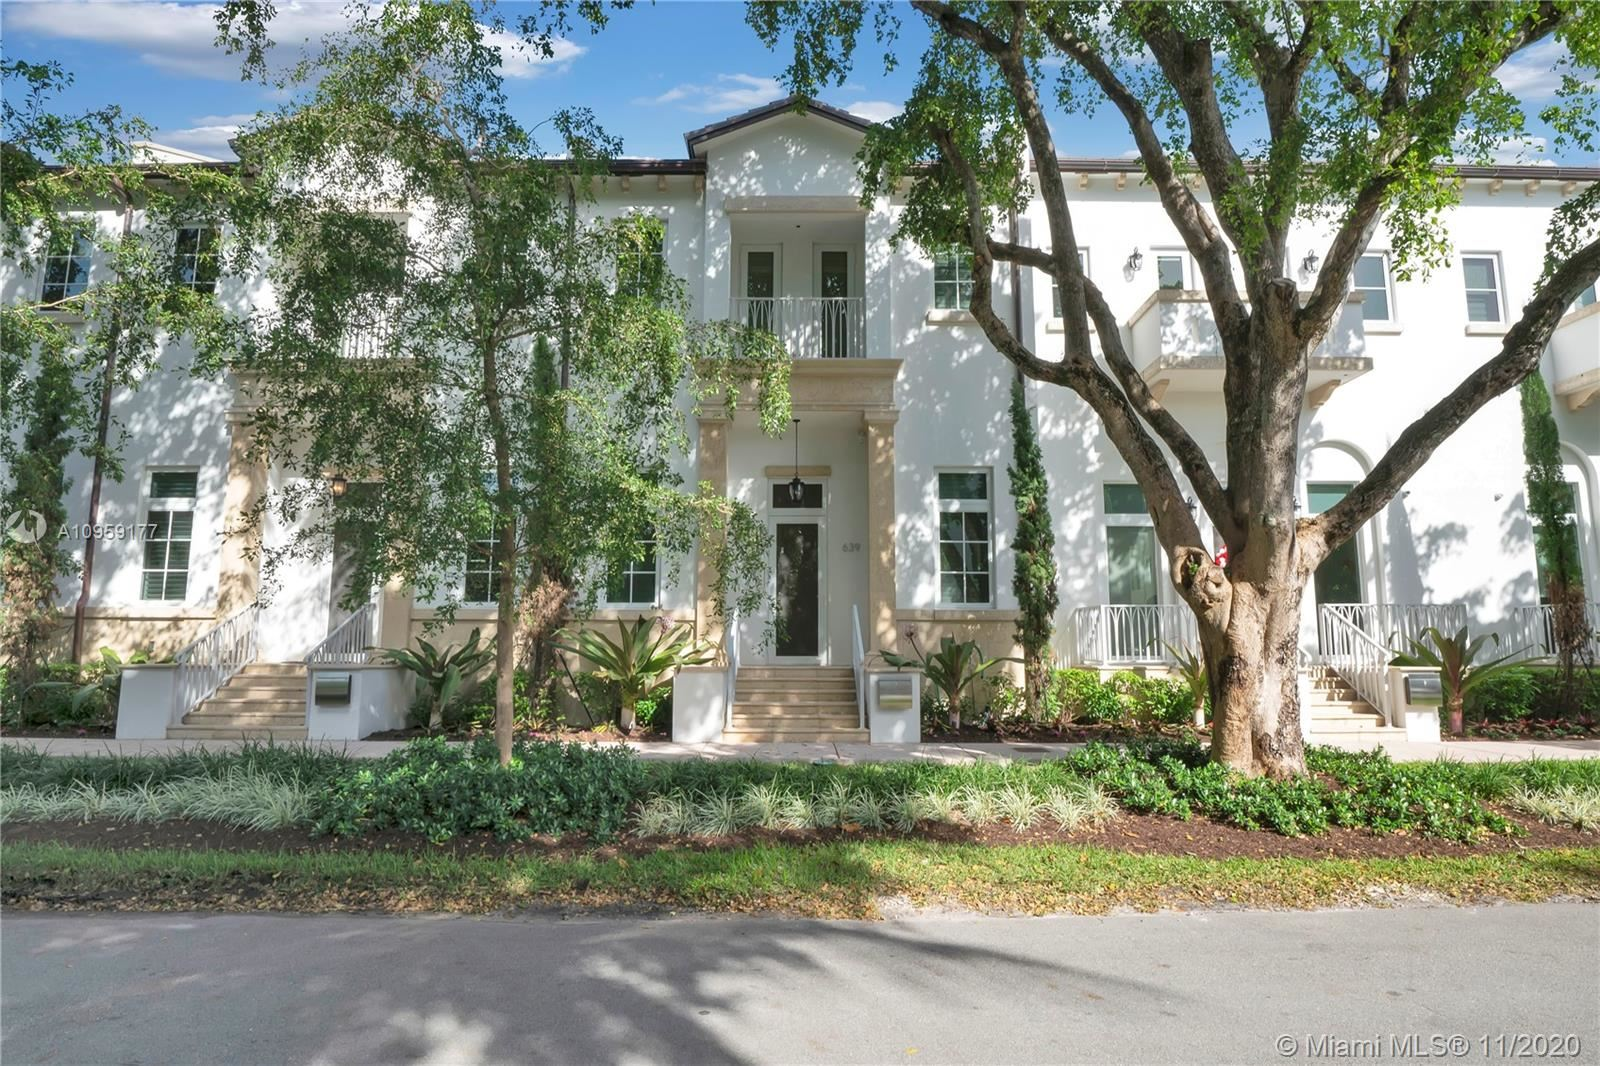 639 Santander Ave #4, Coral Gables, FL 33134 - #: A10959177